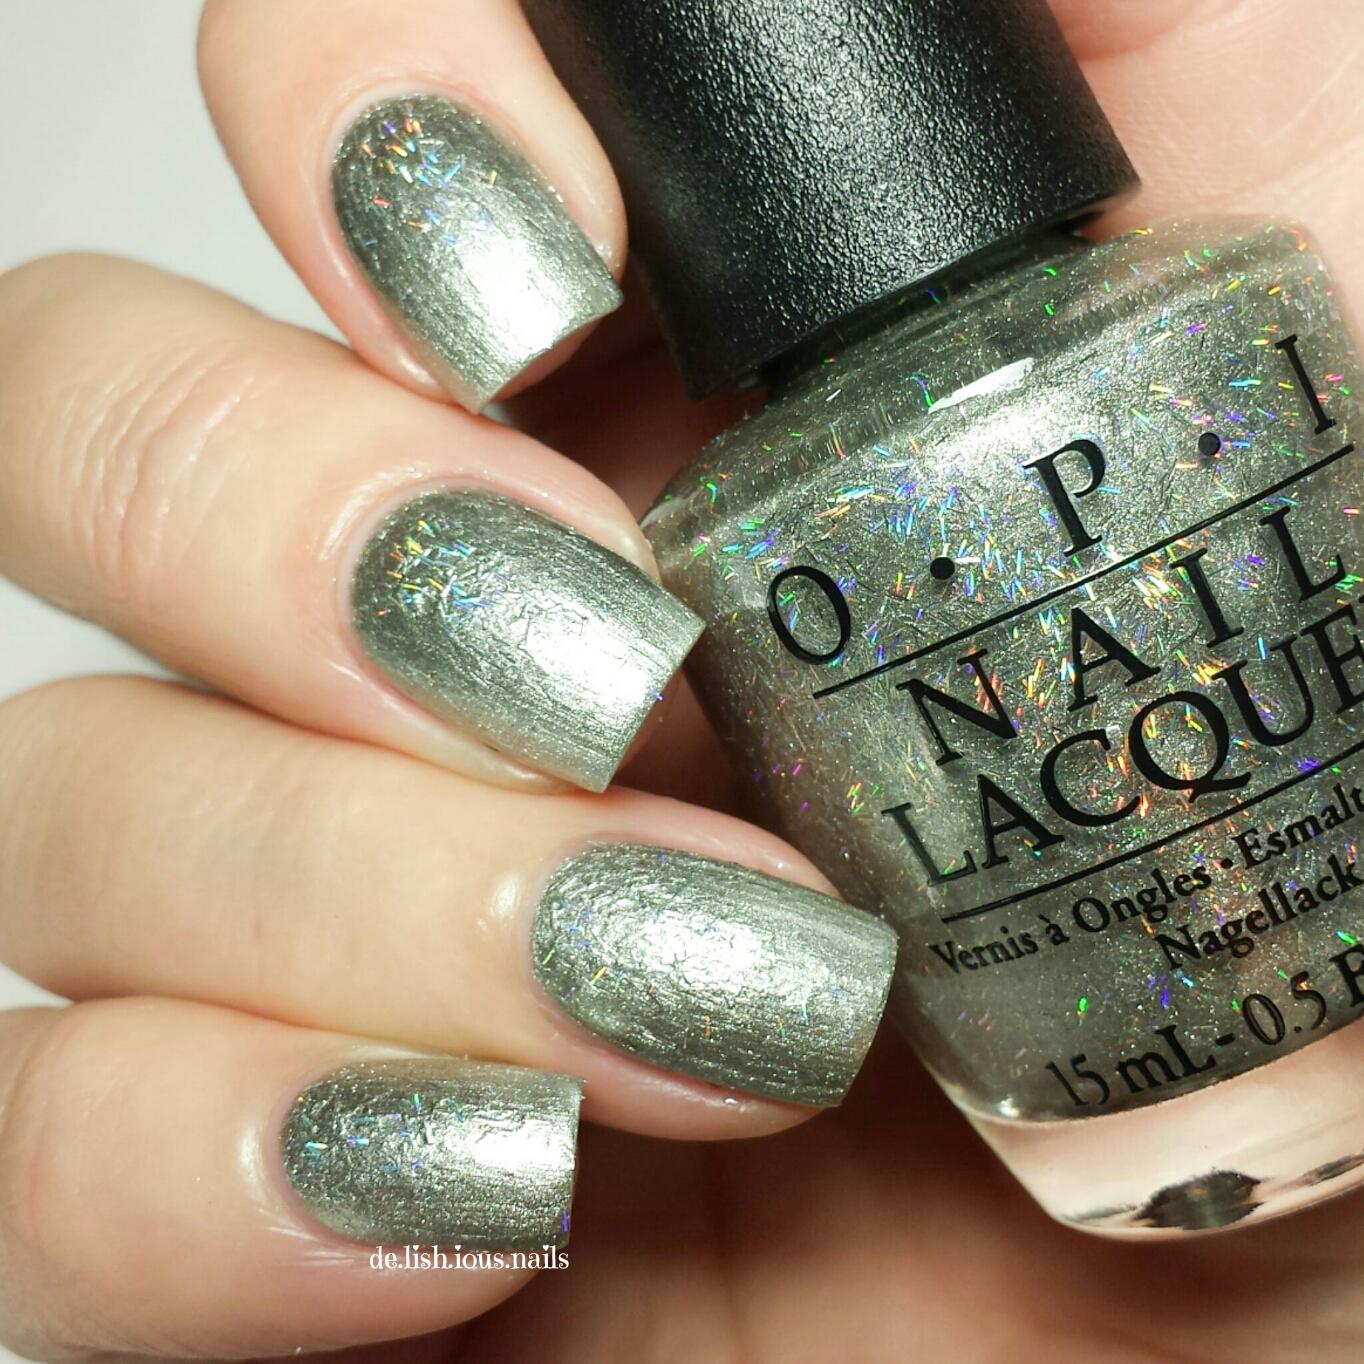 OPI Starlight – De-Lish-ious Nails